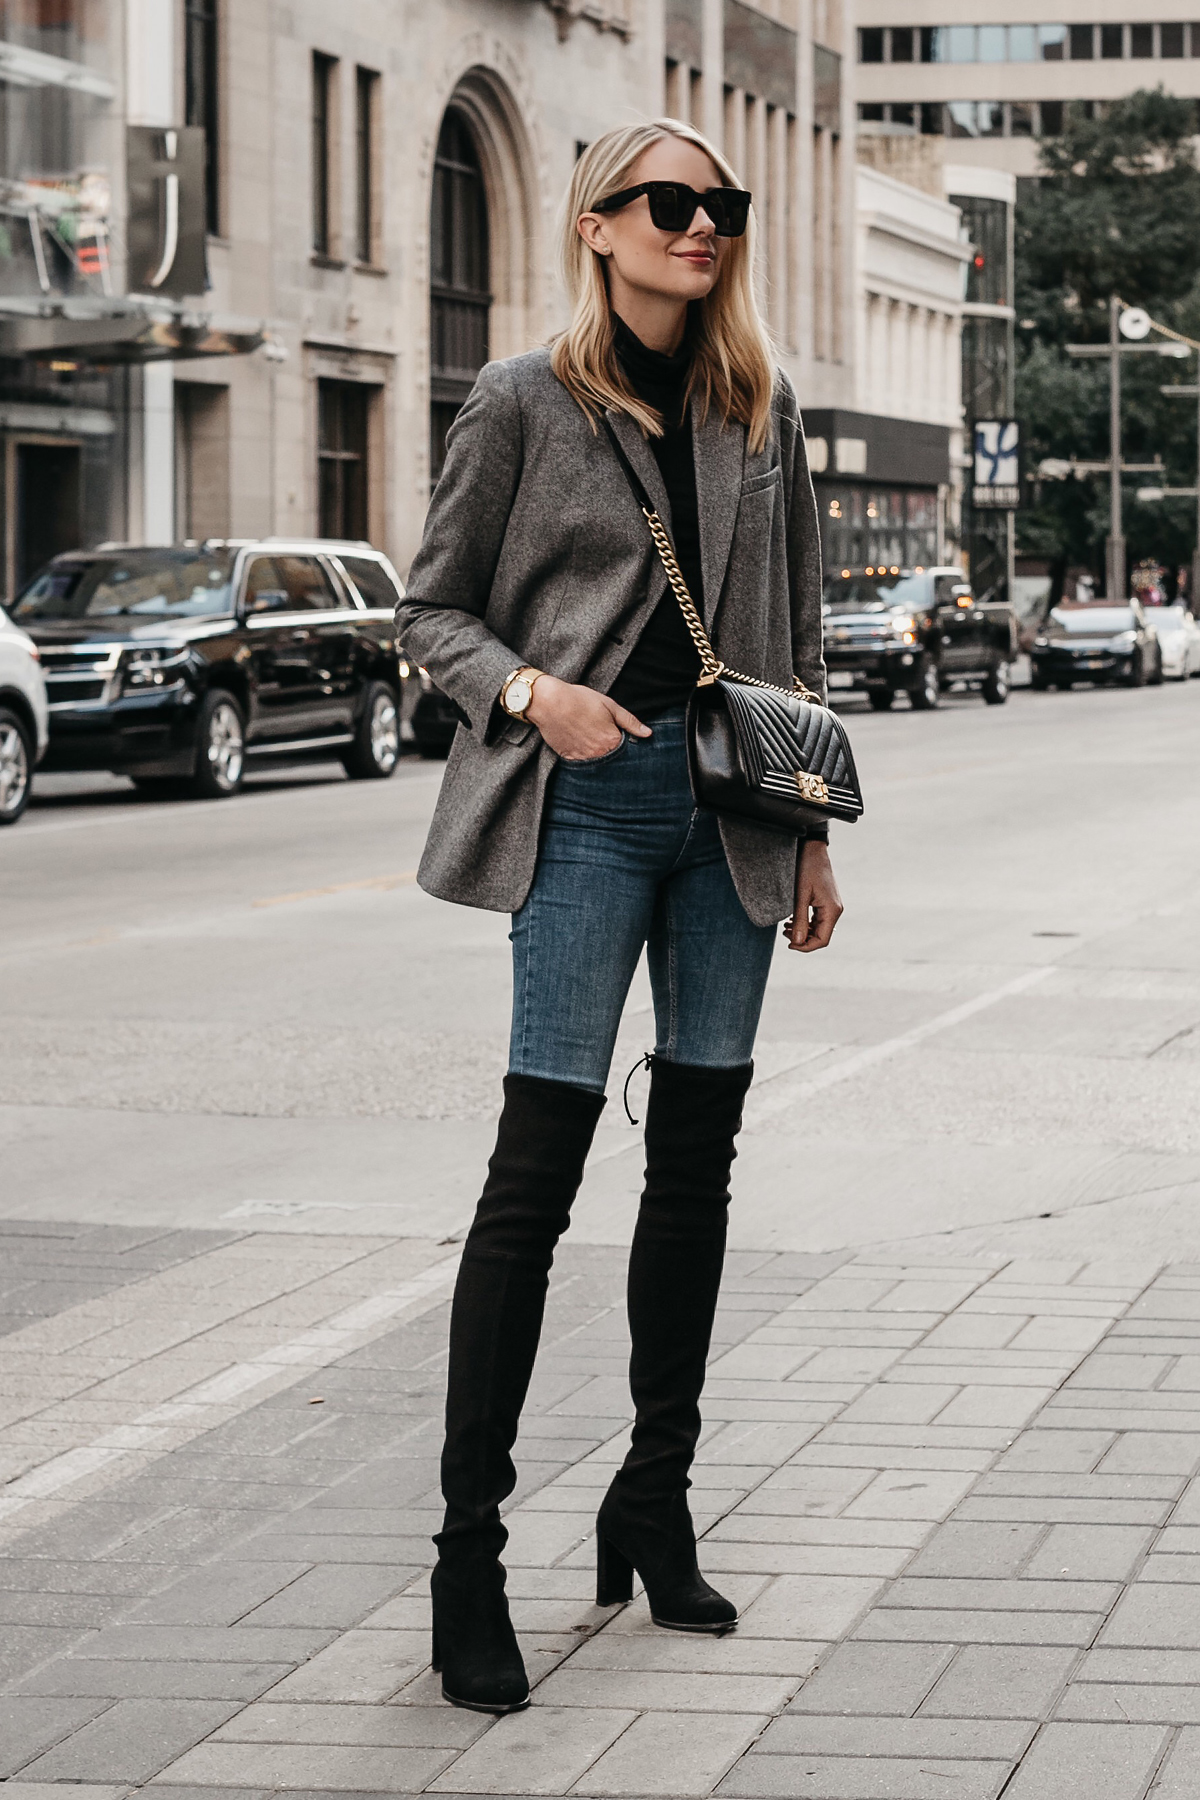 cde06b55090 Blonde Woman Wearing Everlane Oversized Grey Blazer Denim Jeans Stuart  Weitzman Over the Knee Black Boots .